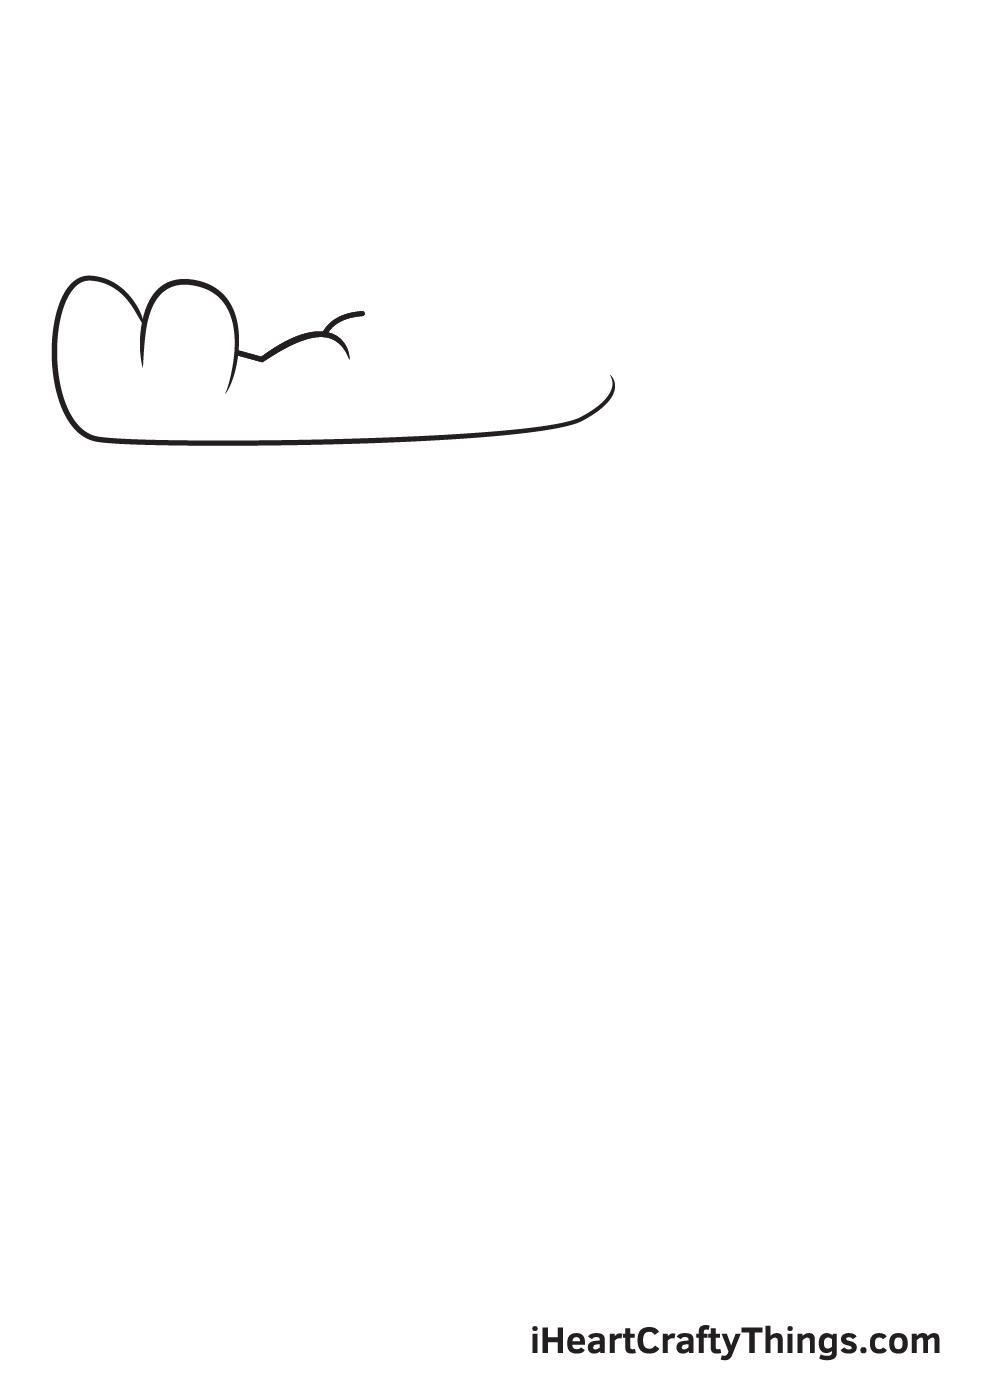 Alligator Drawing – Step 1